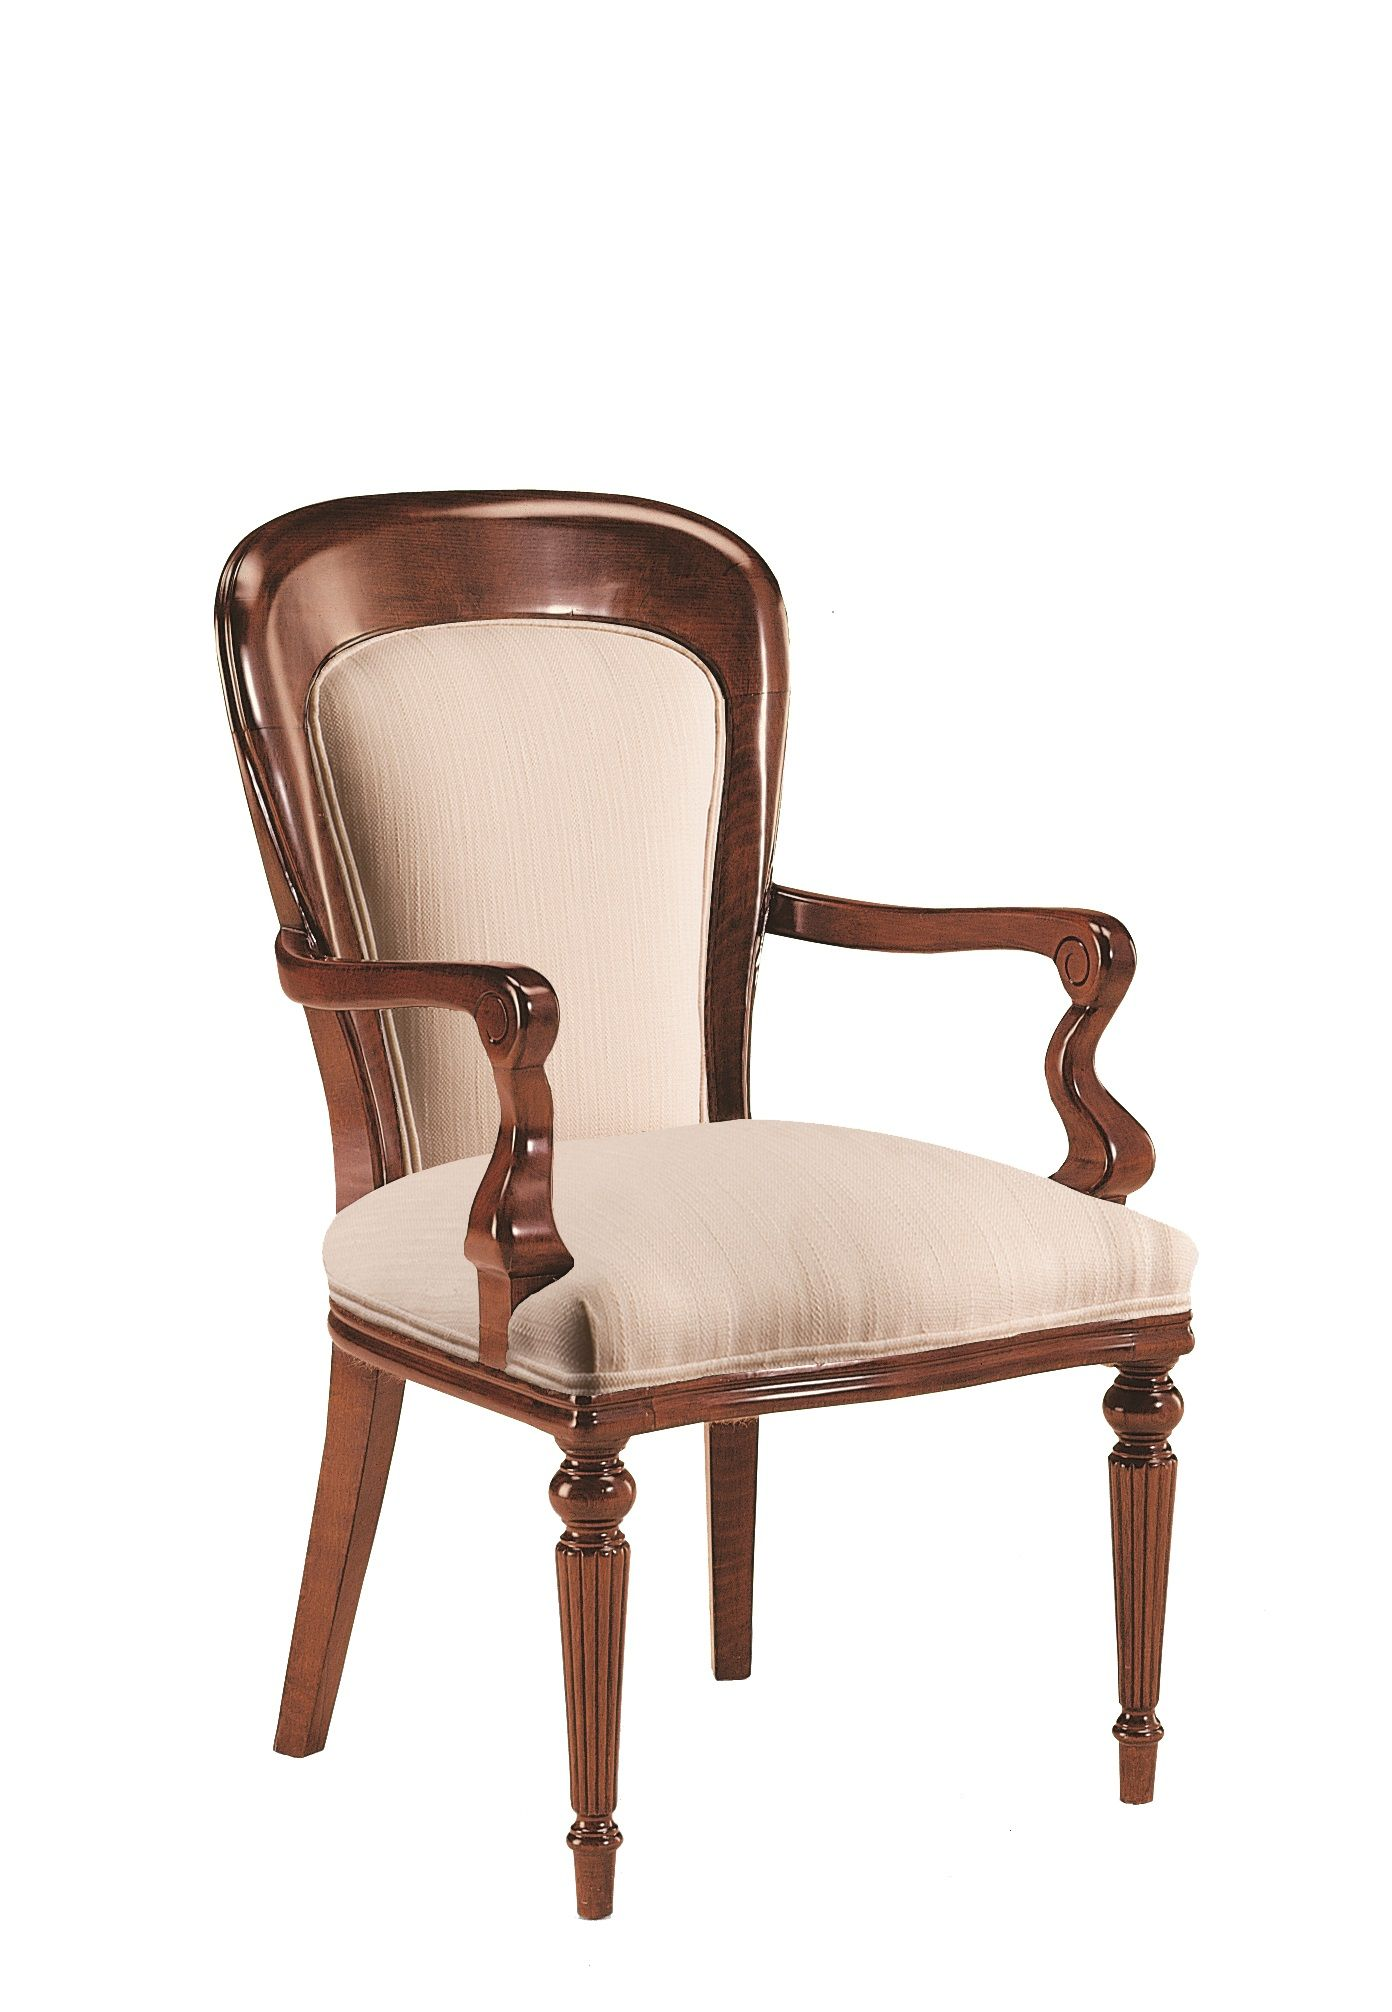 Sillón clásico de estilo victoriano